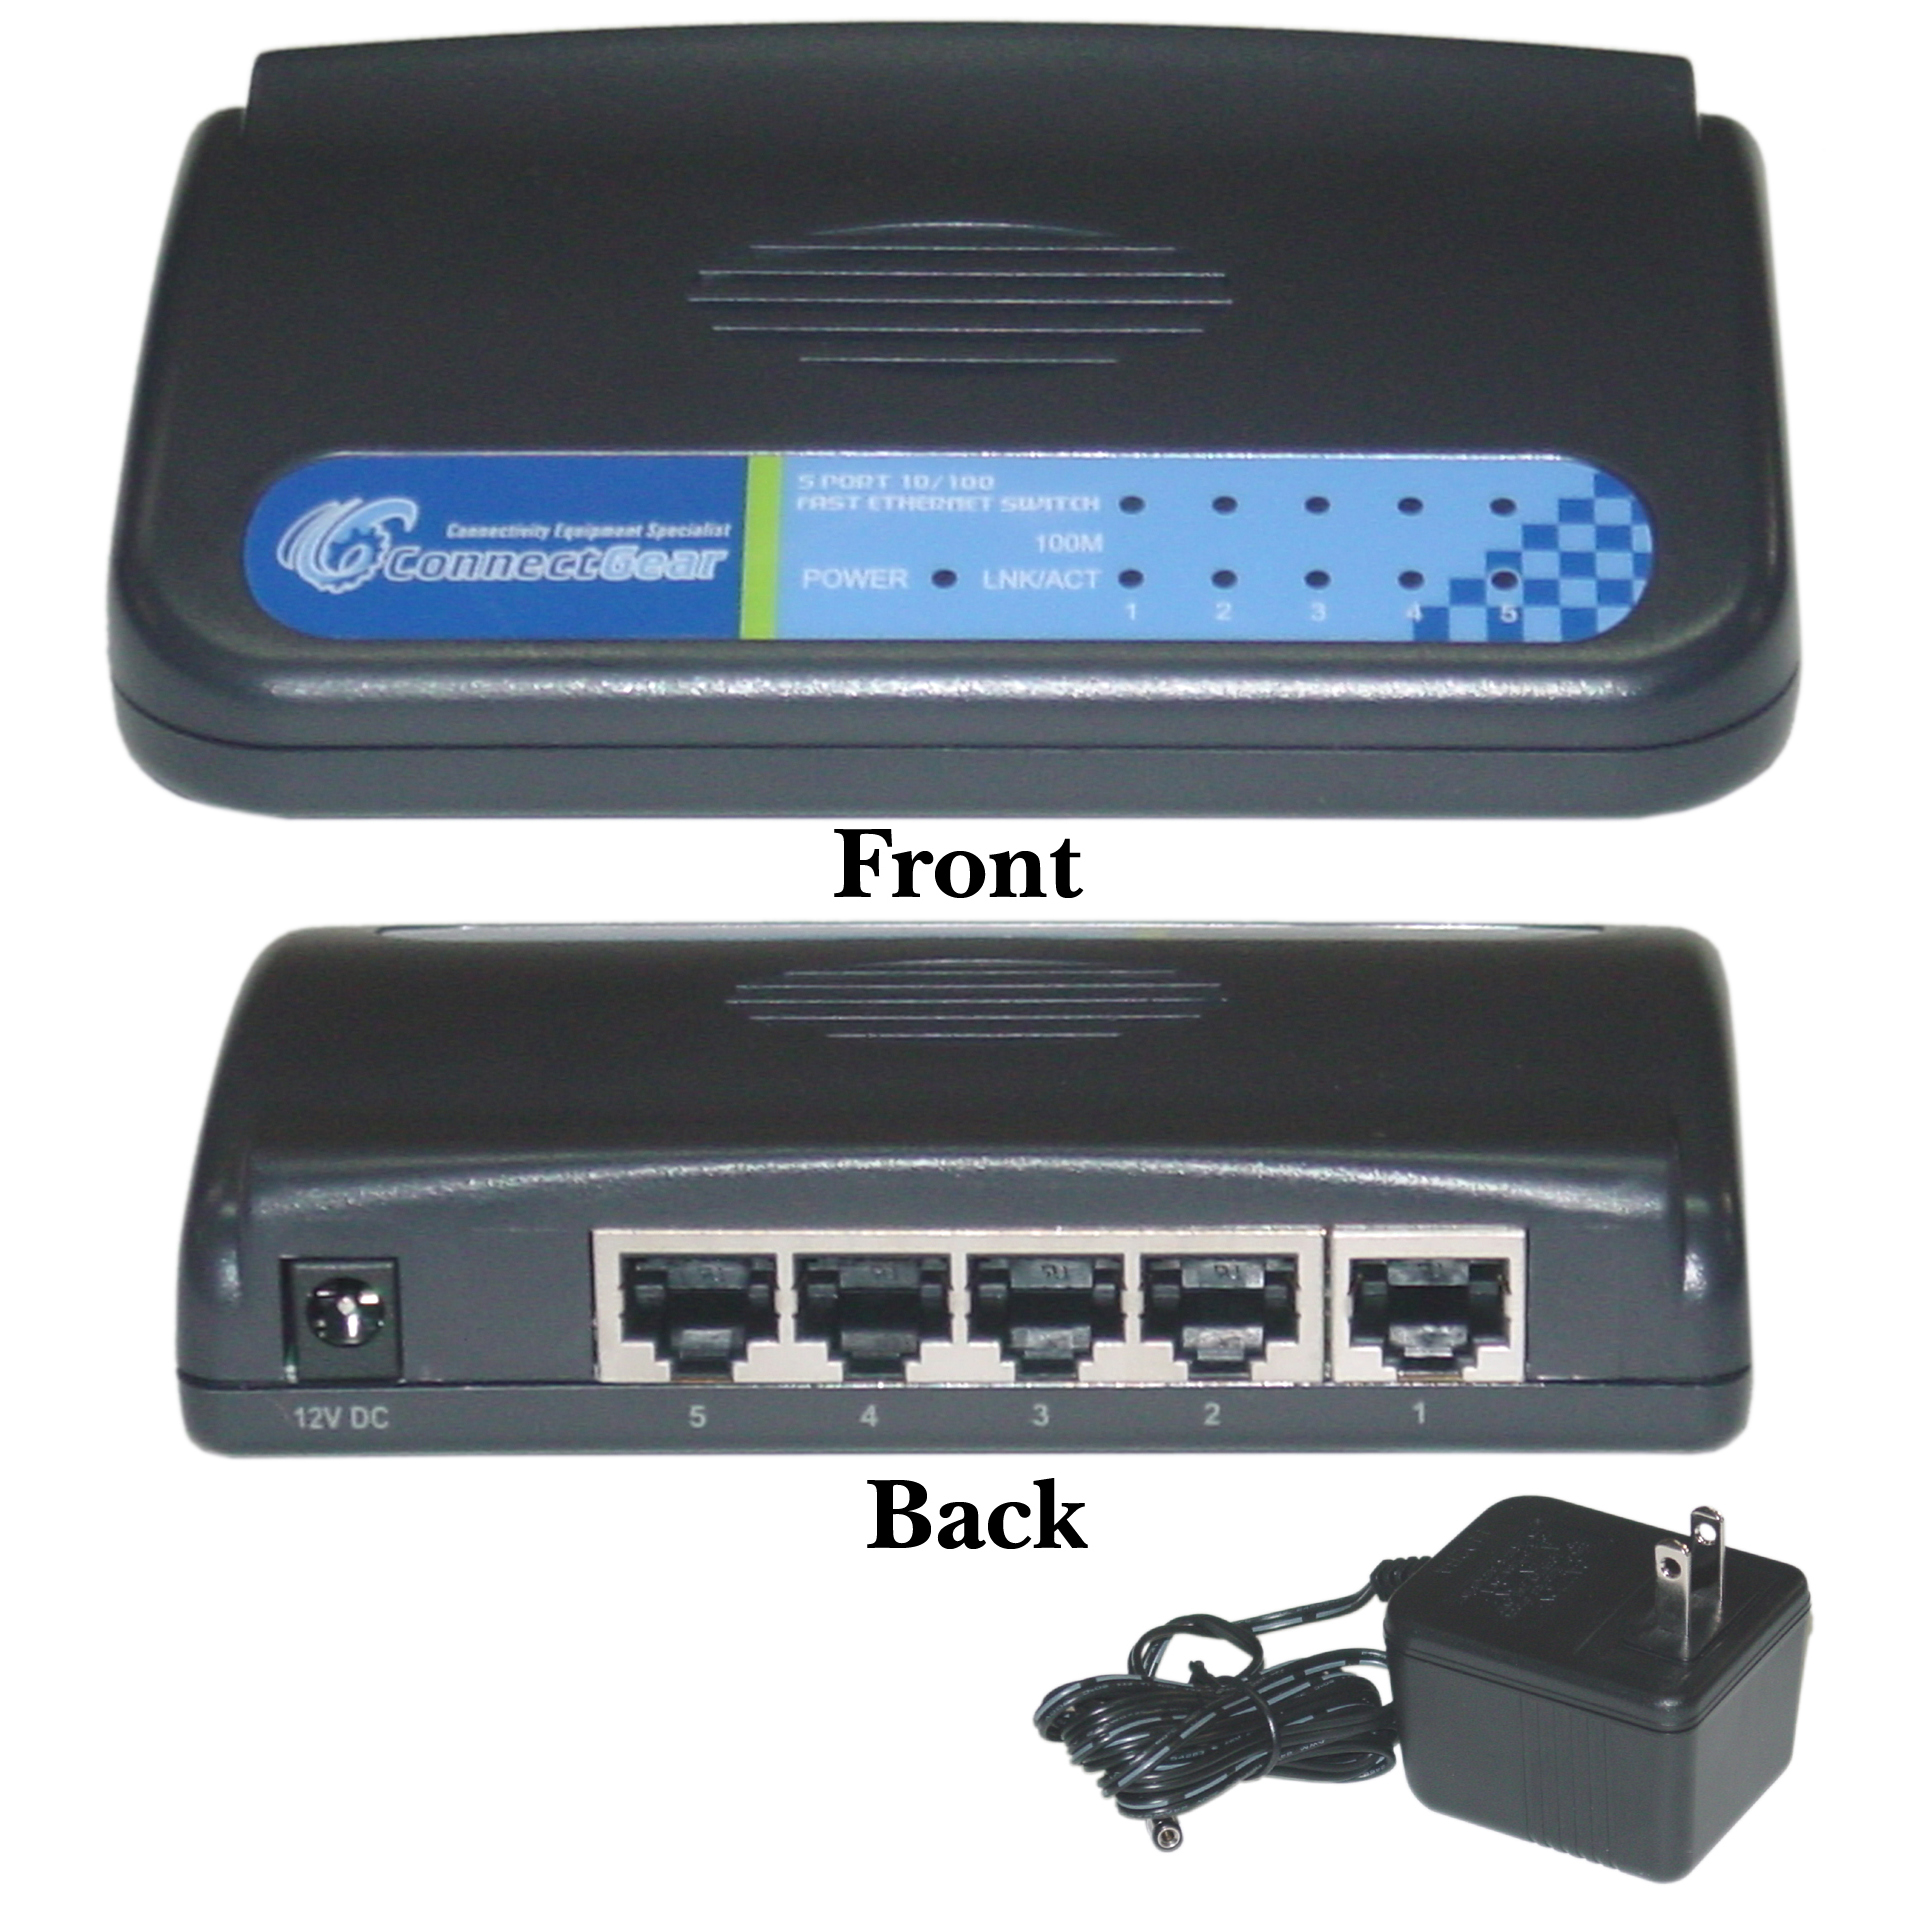 5 Port Fast Ethernet Switch 10 100 Auto Negotiation Mbps Part